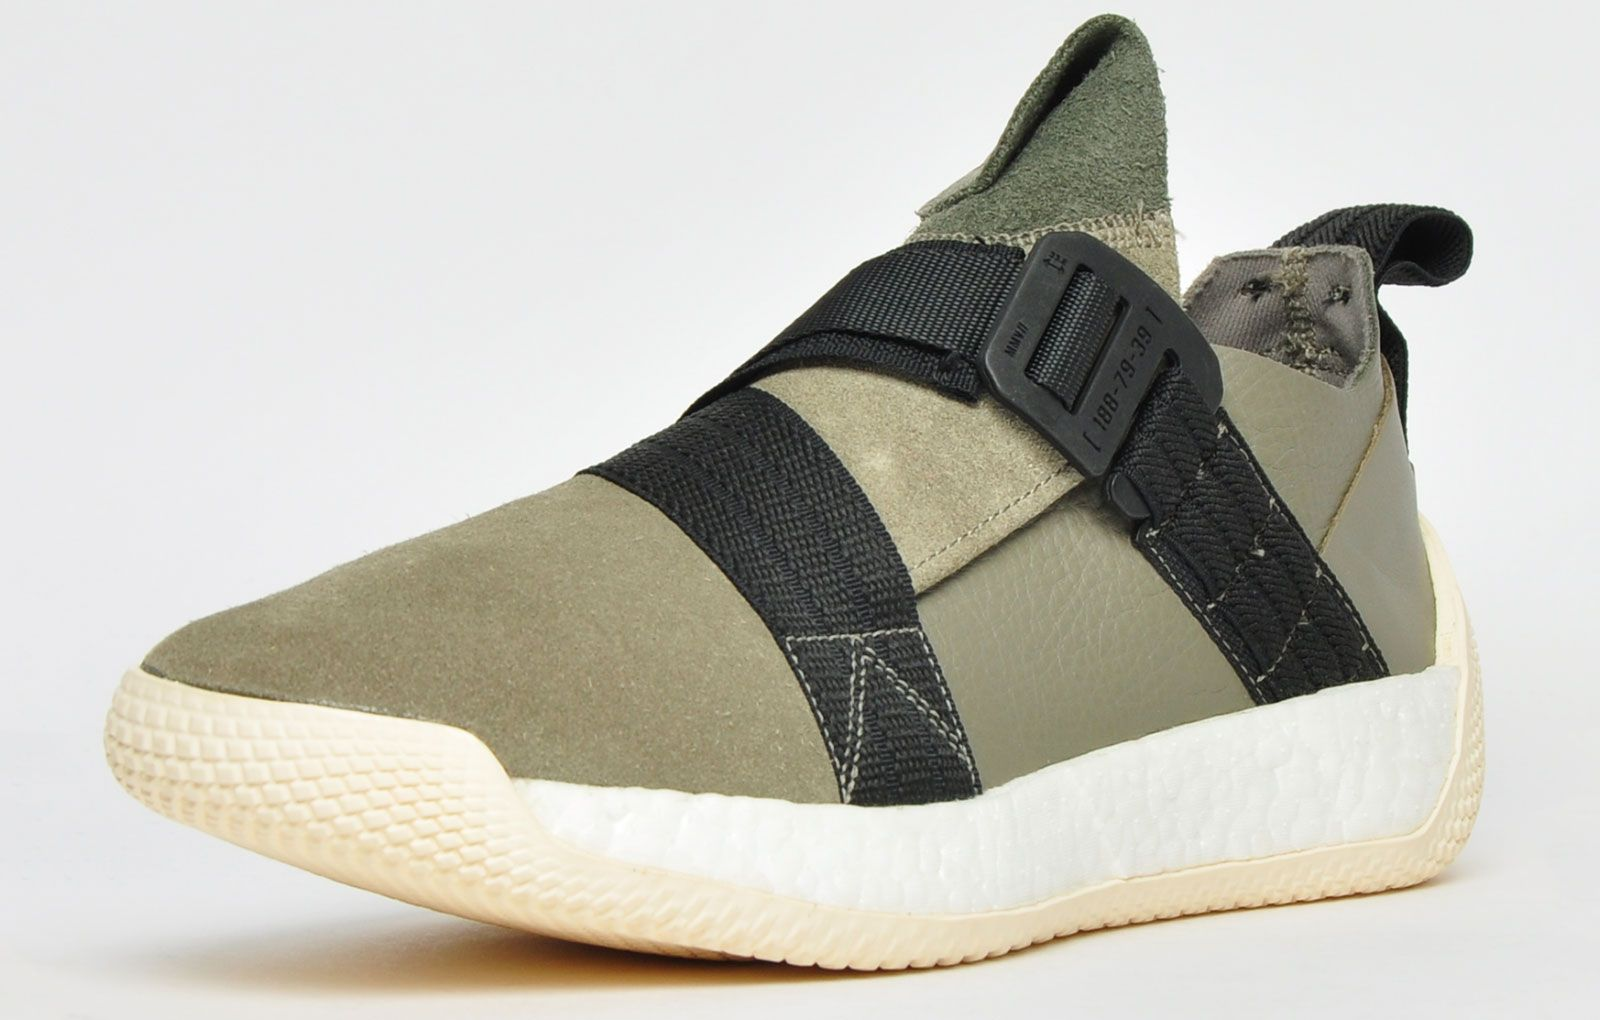 Adidas Harden Boost LS 2 Buckle Mens